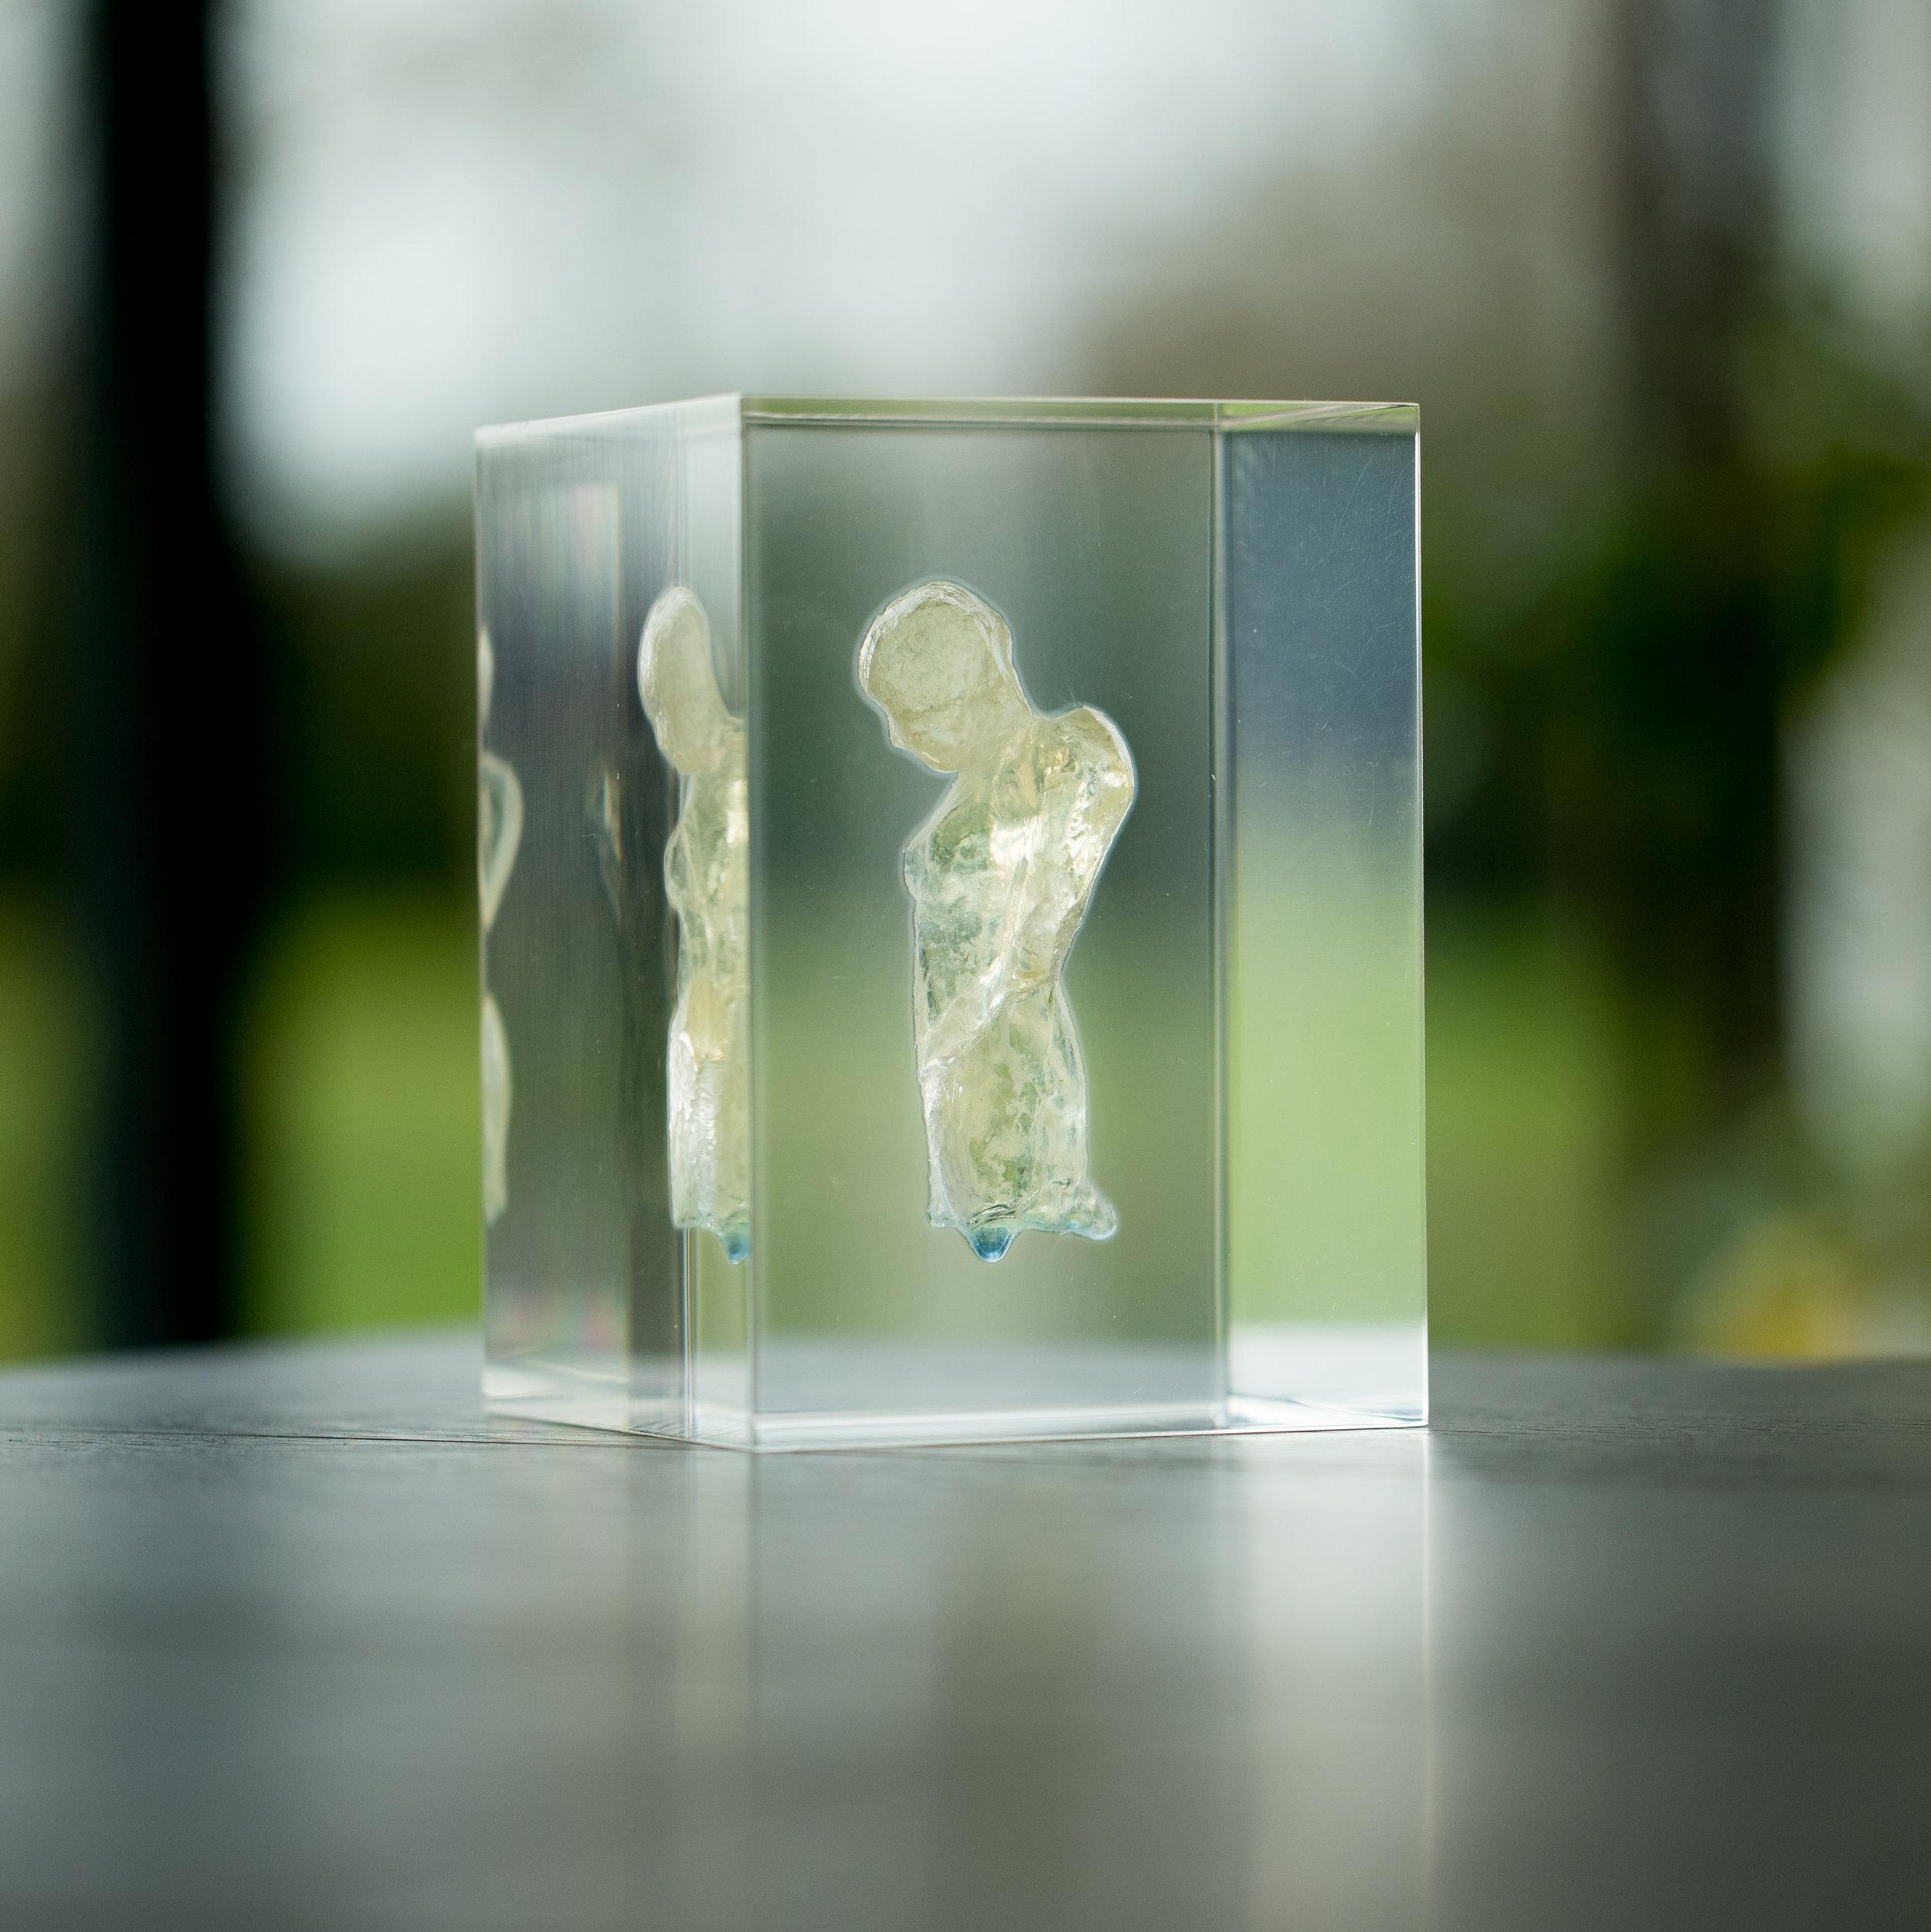 Artist: Kate Viner  Title: Encapsulation - Fallen Angels Series  Size: 14.5 x 10 x 10 cm  Medium: Glass figure in a perspex cube  SOLD